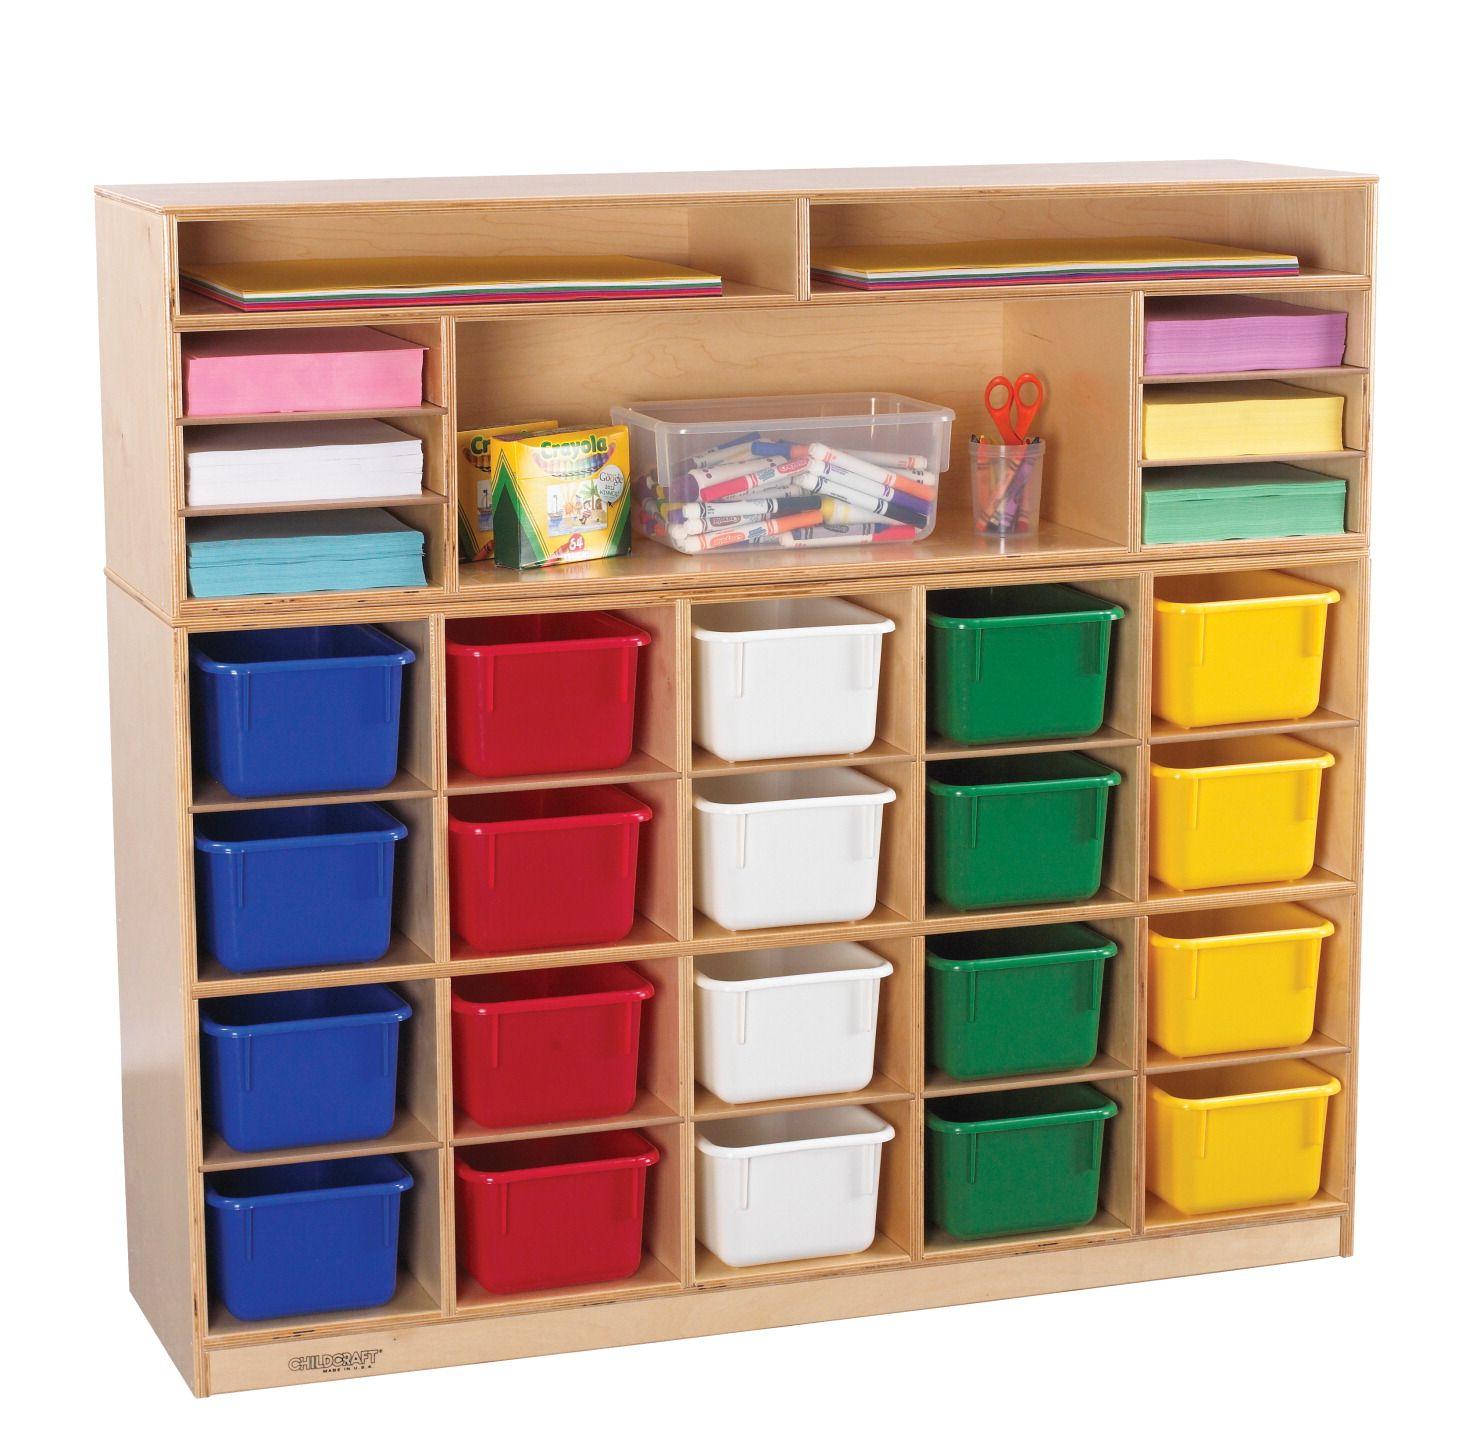 2? 100 ea Shelf Organizer Topper SCHOOL SPECIALTY